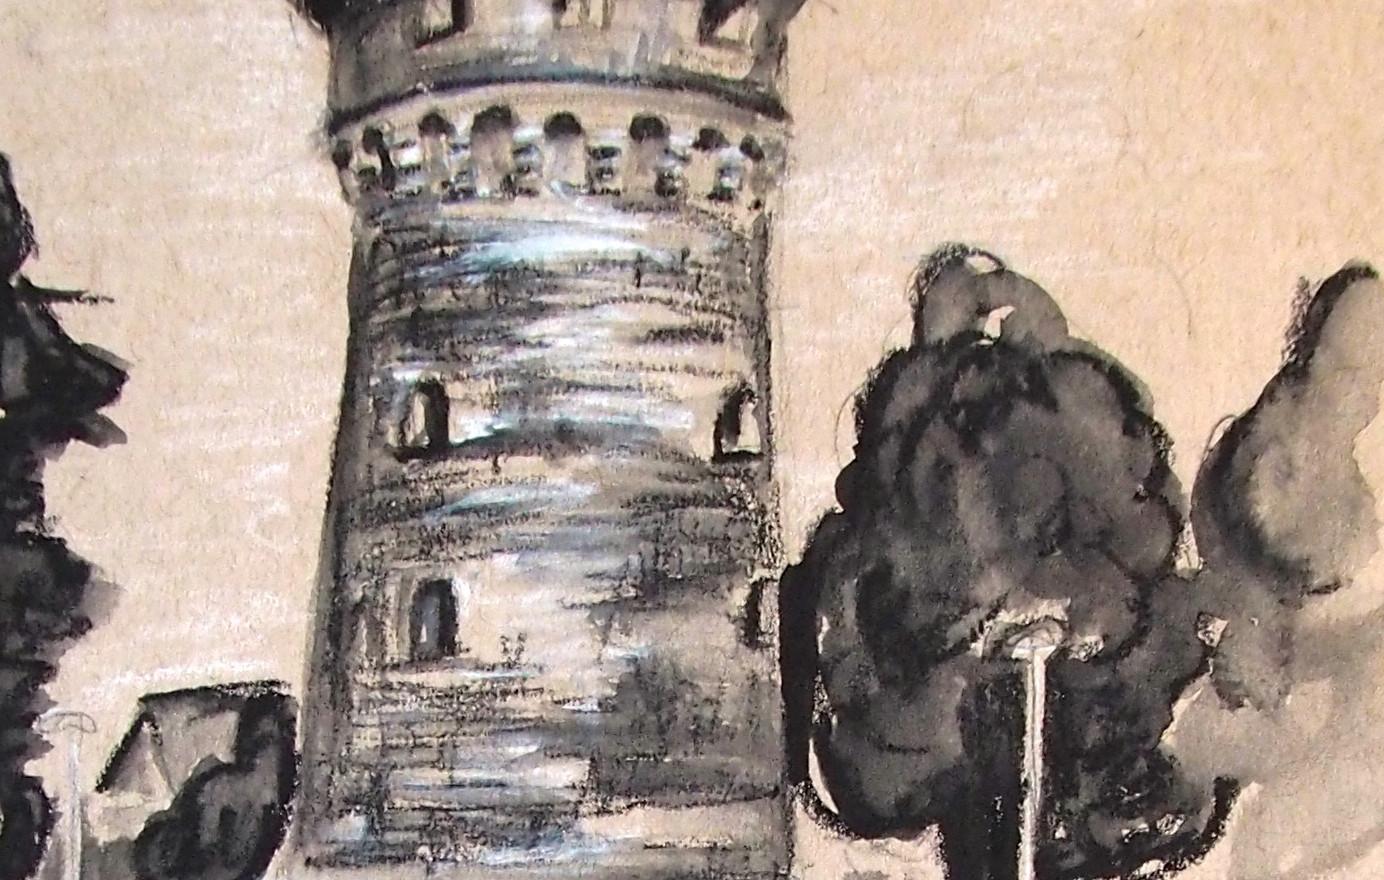 Køge Tower, Køge DENMARK